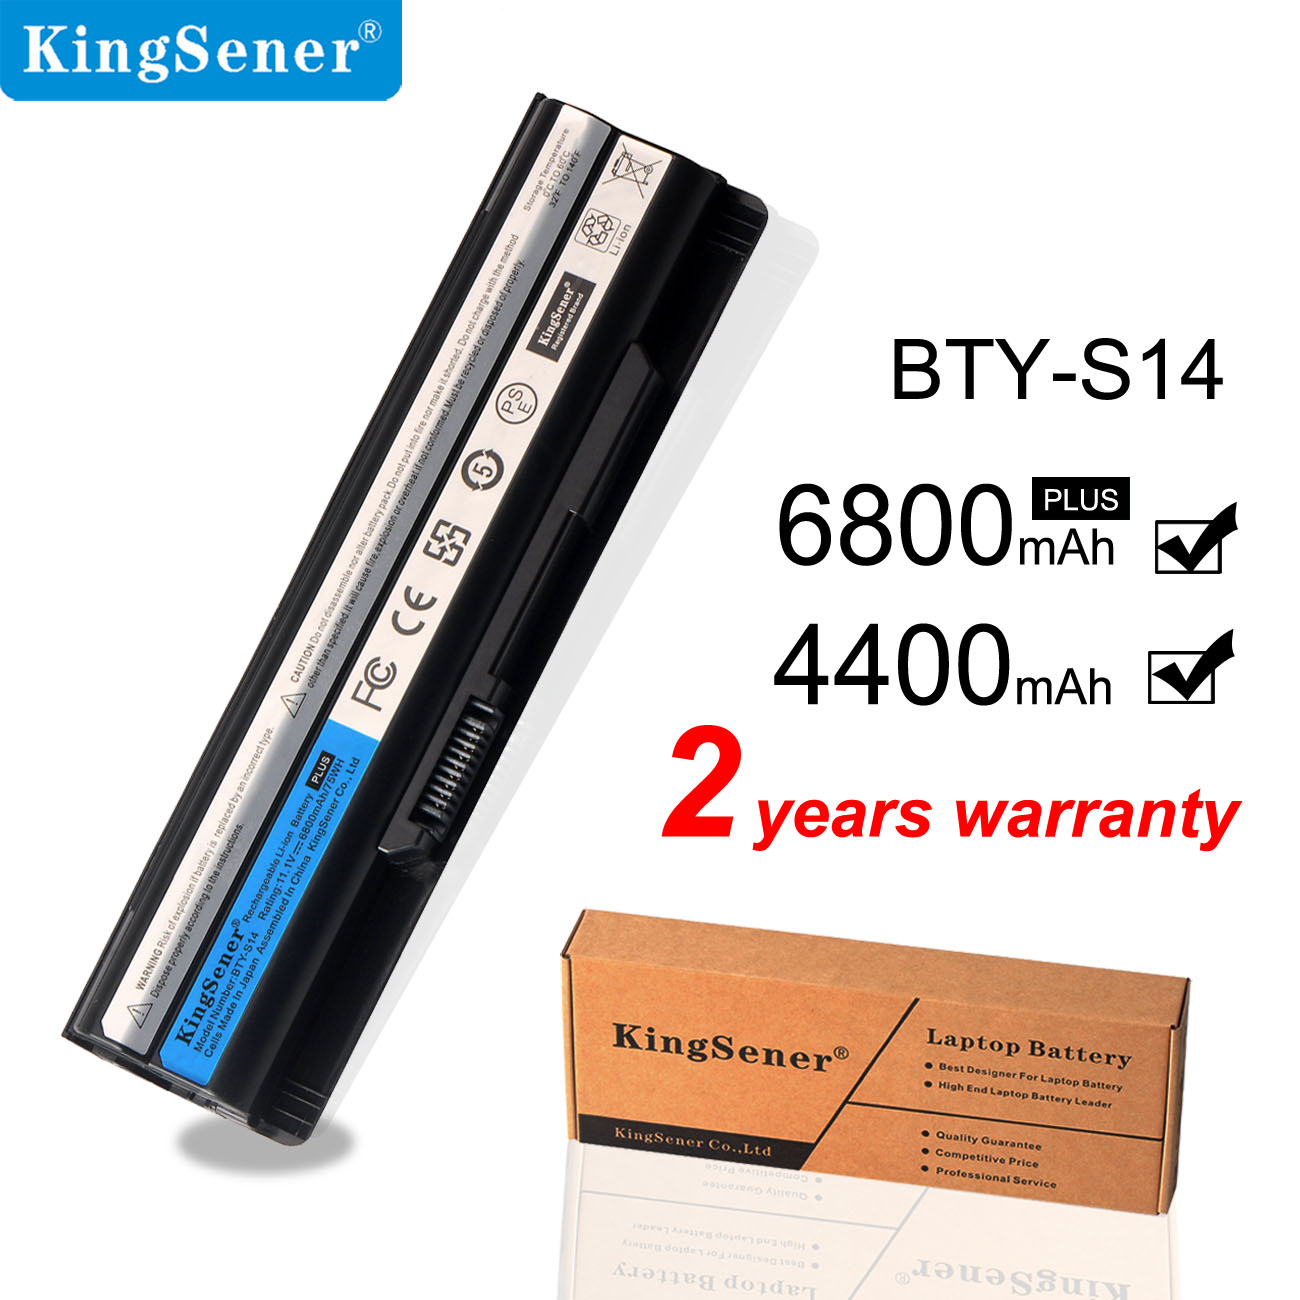 KingSener Laptop Battery For MSI BTY-S14 GE70 GE60 CR41 CX61 CR70 BTY-S15 CR650 CX650 FR400 FR600 FR610 FR620 FR700 FX420 FX600